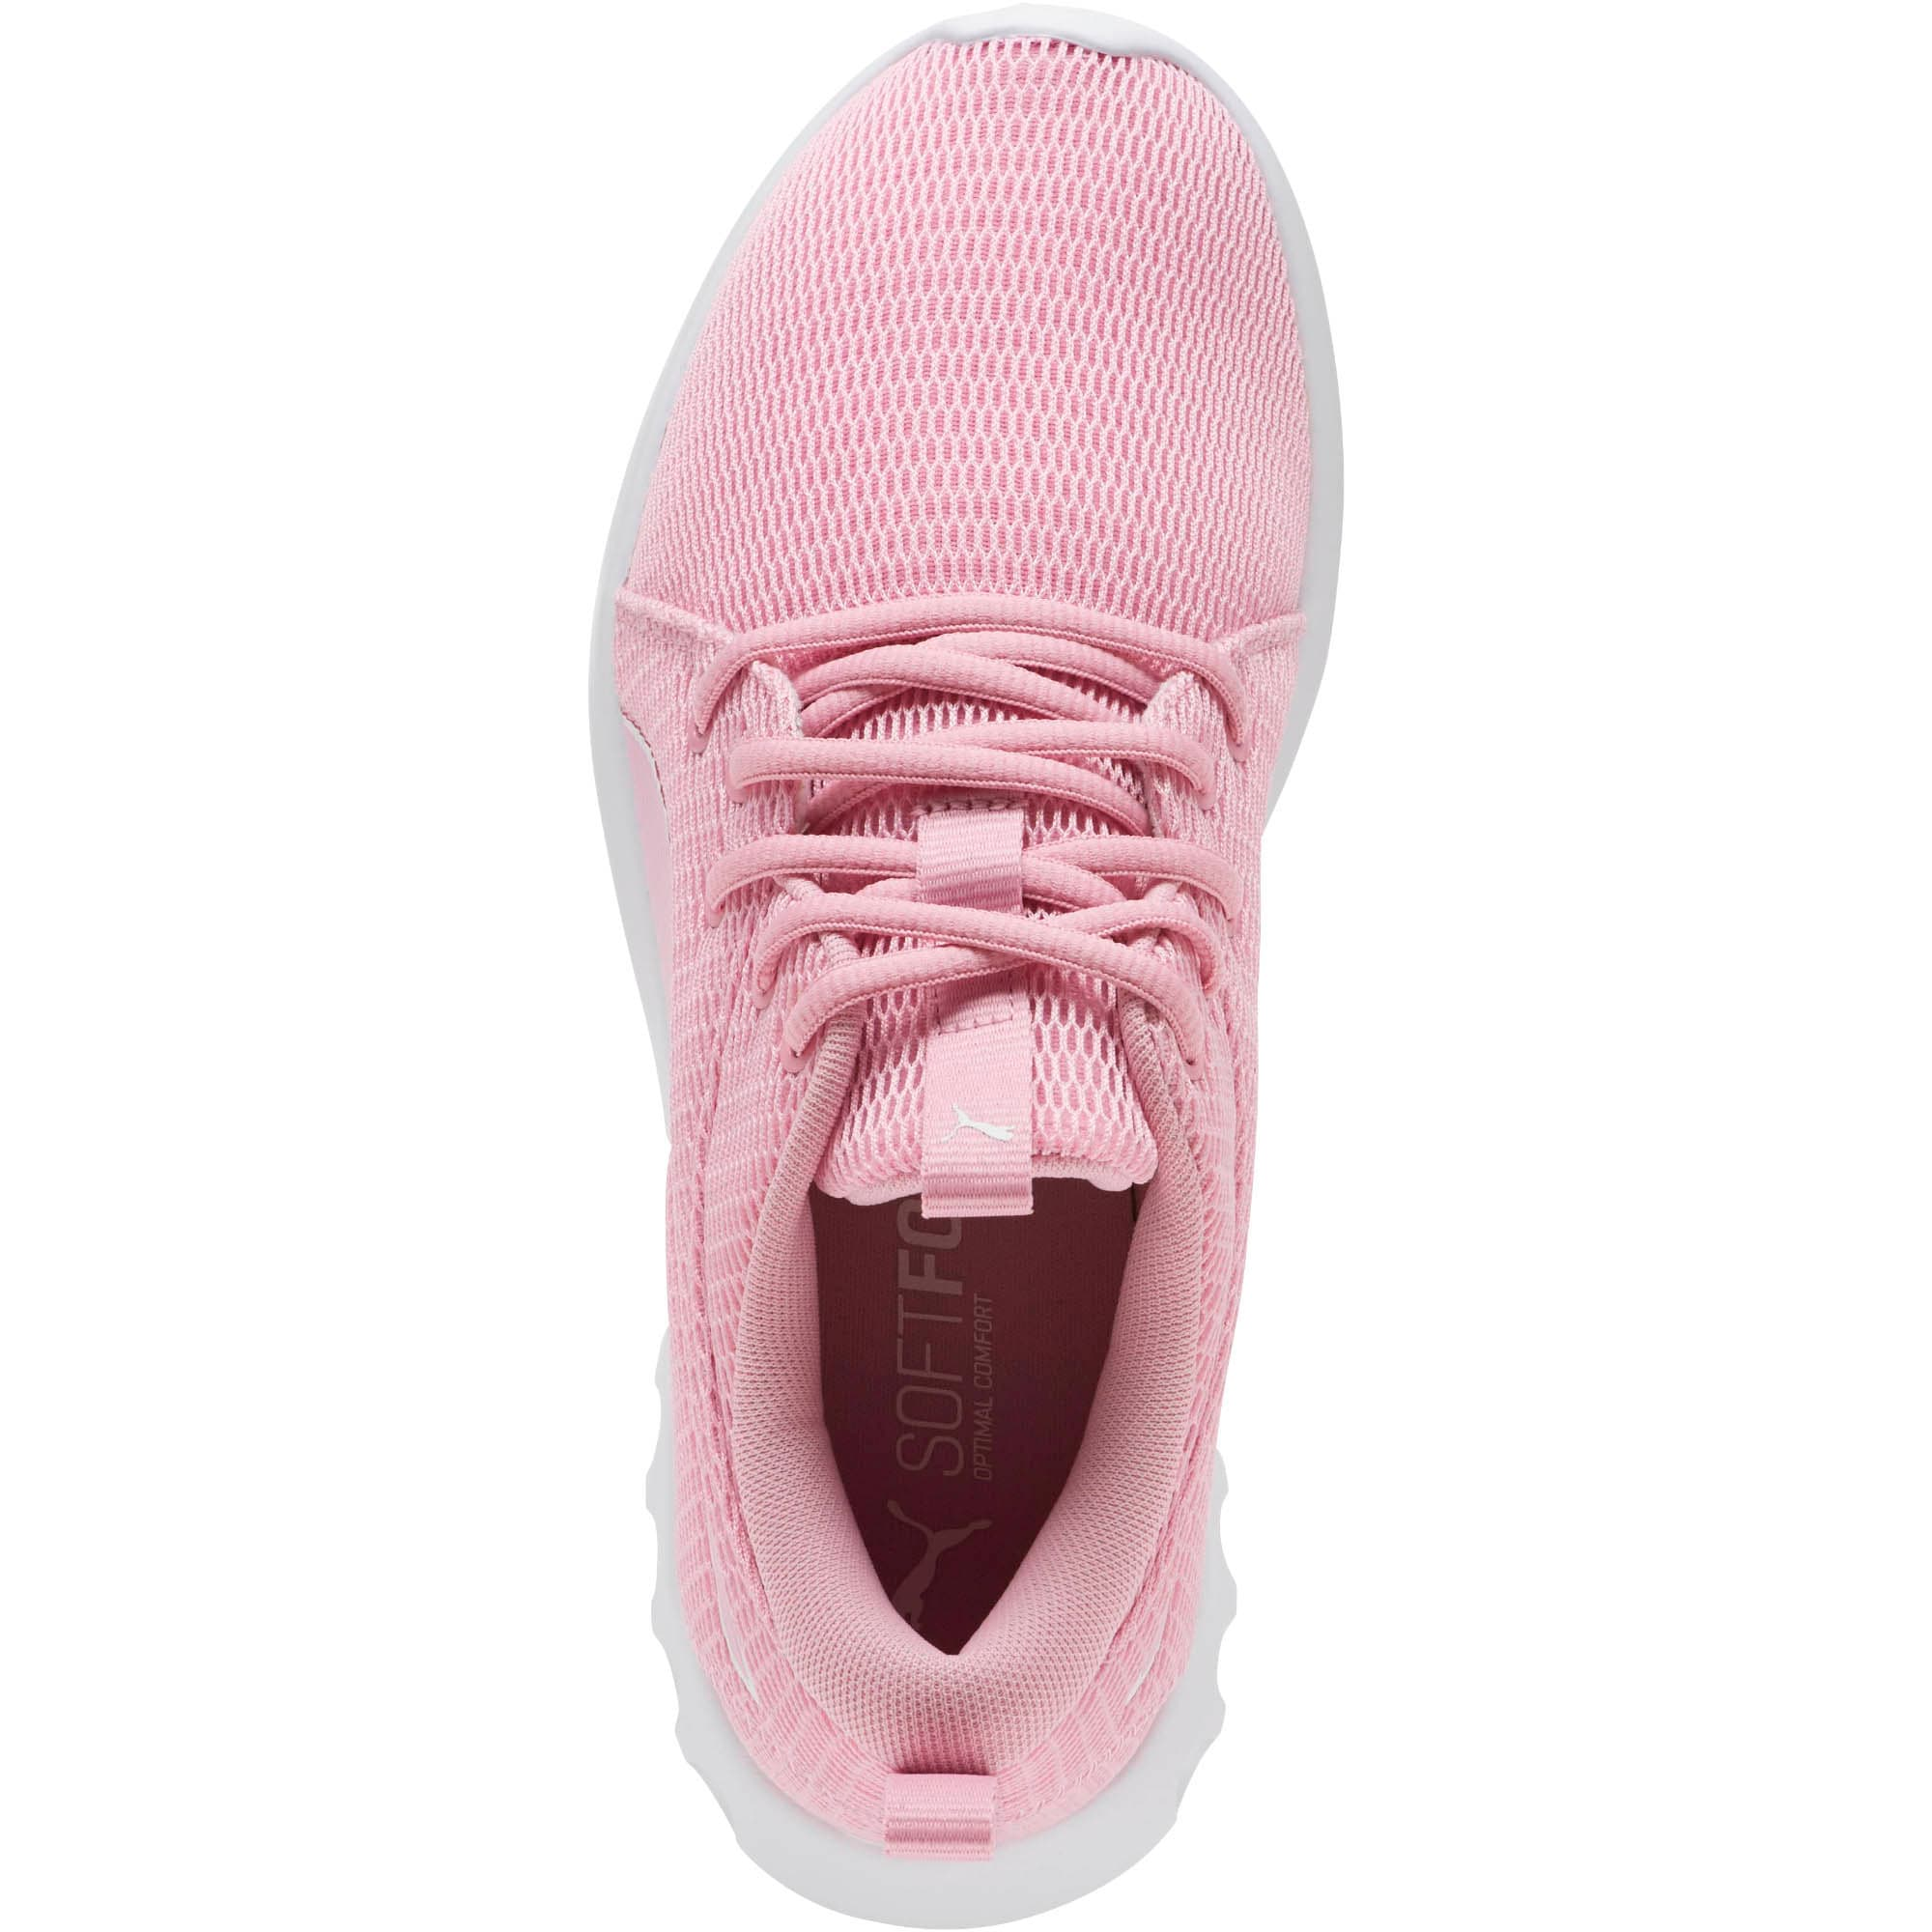 Thumbnail 5 of Carson 2 New Core Women's Training Shoes, Pale Pink-Puma White, medium